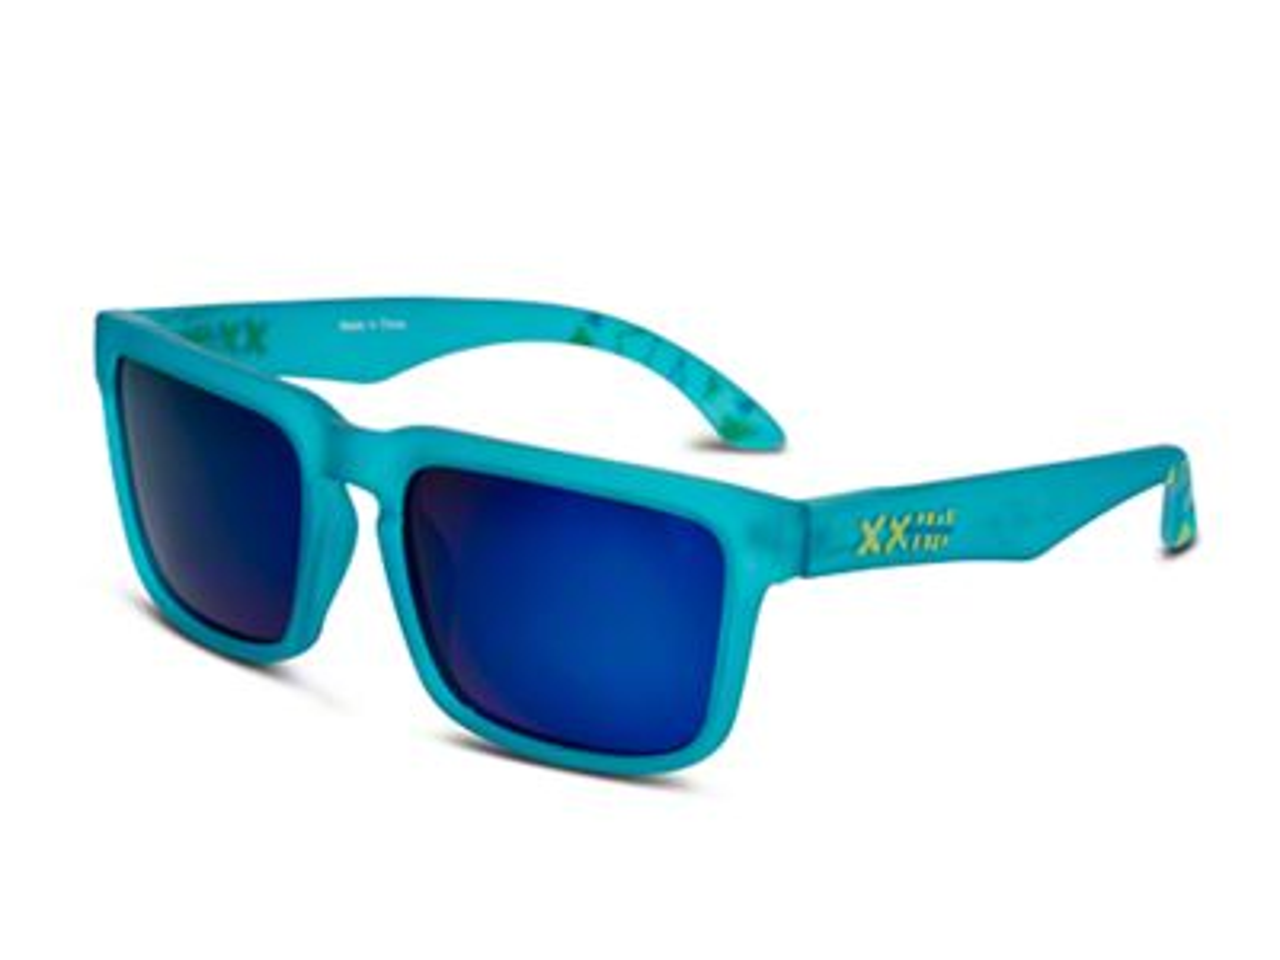 RTR VGRJ Signature Sunglasses - Blue/Blue Triangles